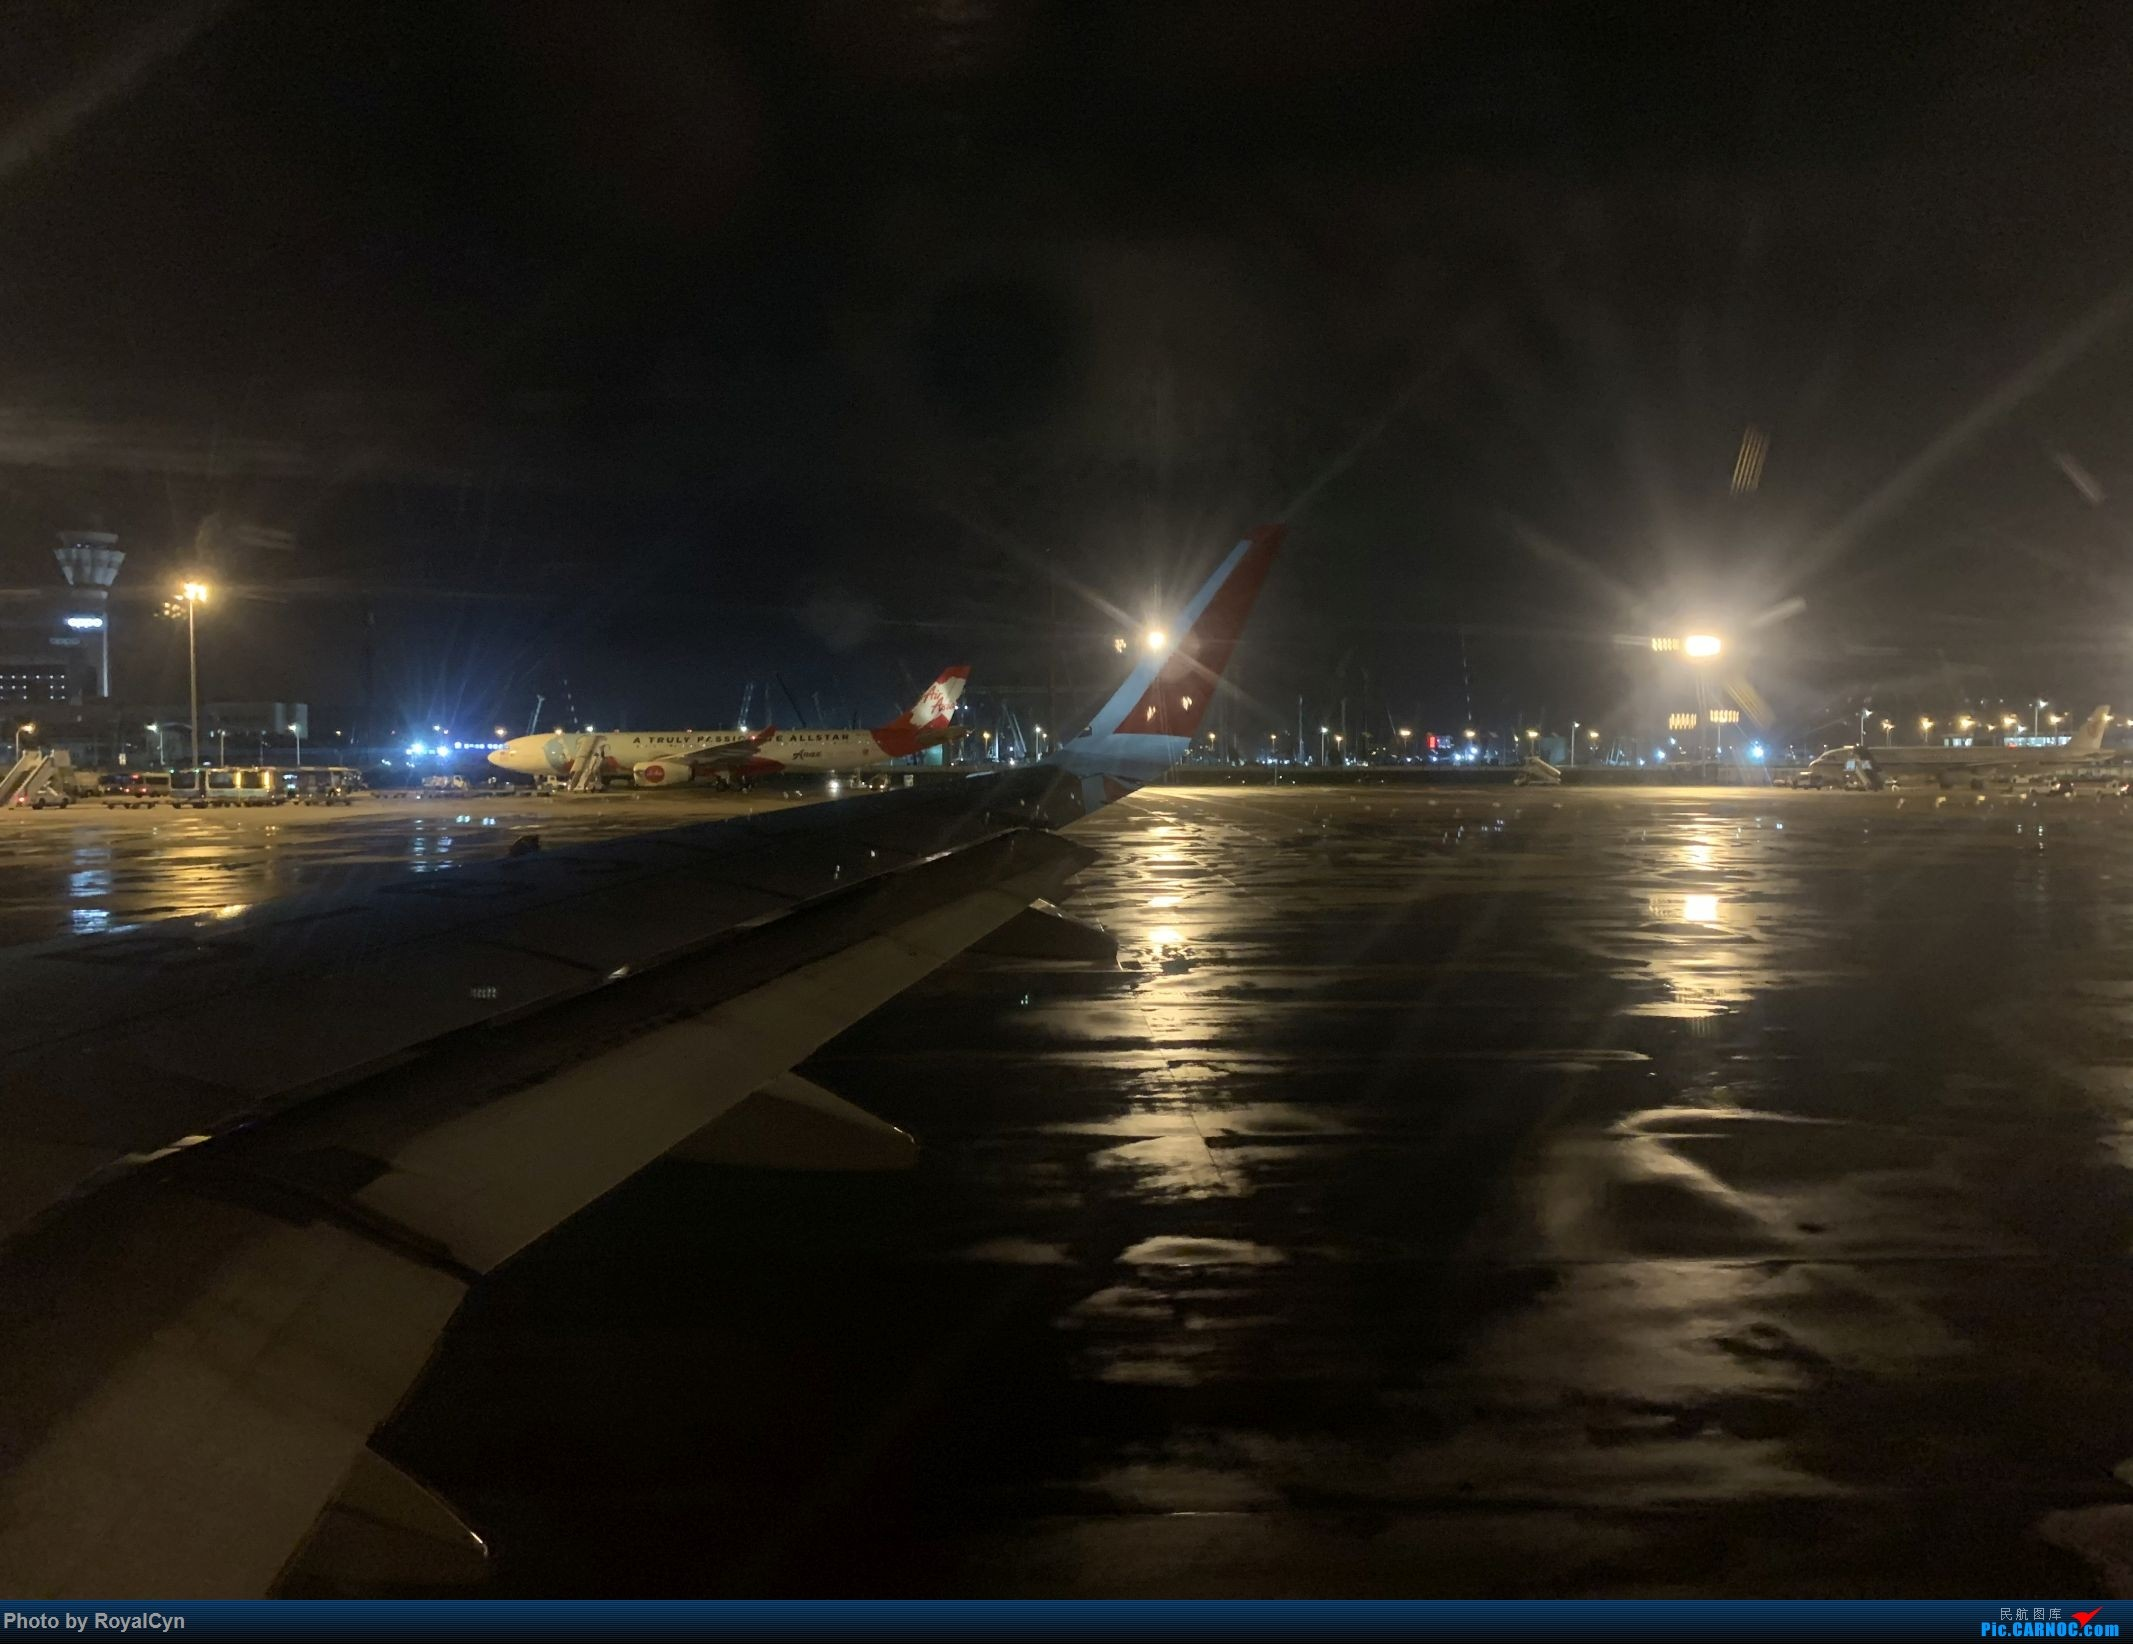 Re:[原创]Royal游记No.3【佛塔国度狂想曲——棉麻国缅甸】三城6日游 AIRBUS A330-300 9MXXH 中国杭州萧山国际机场